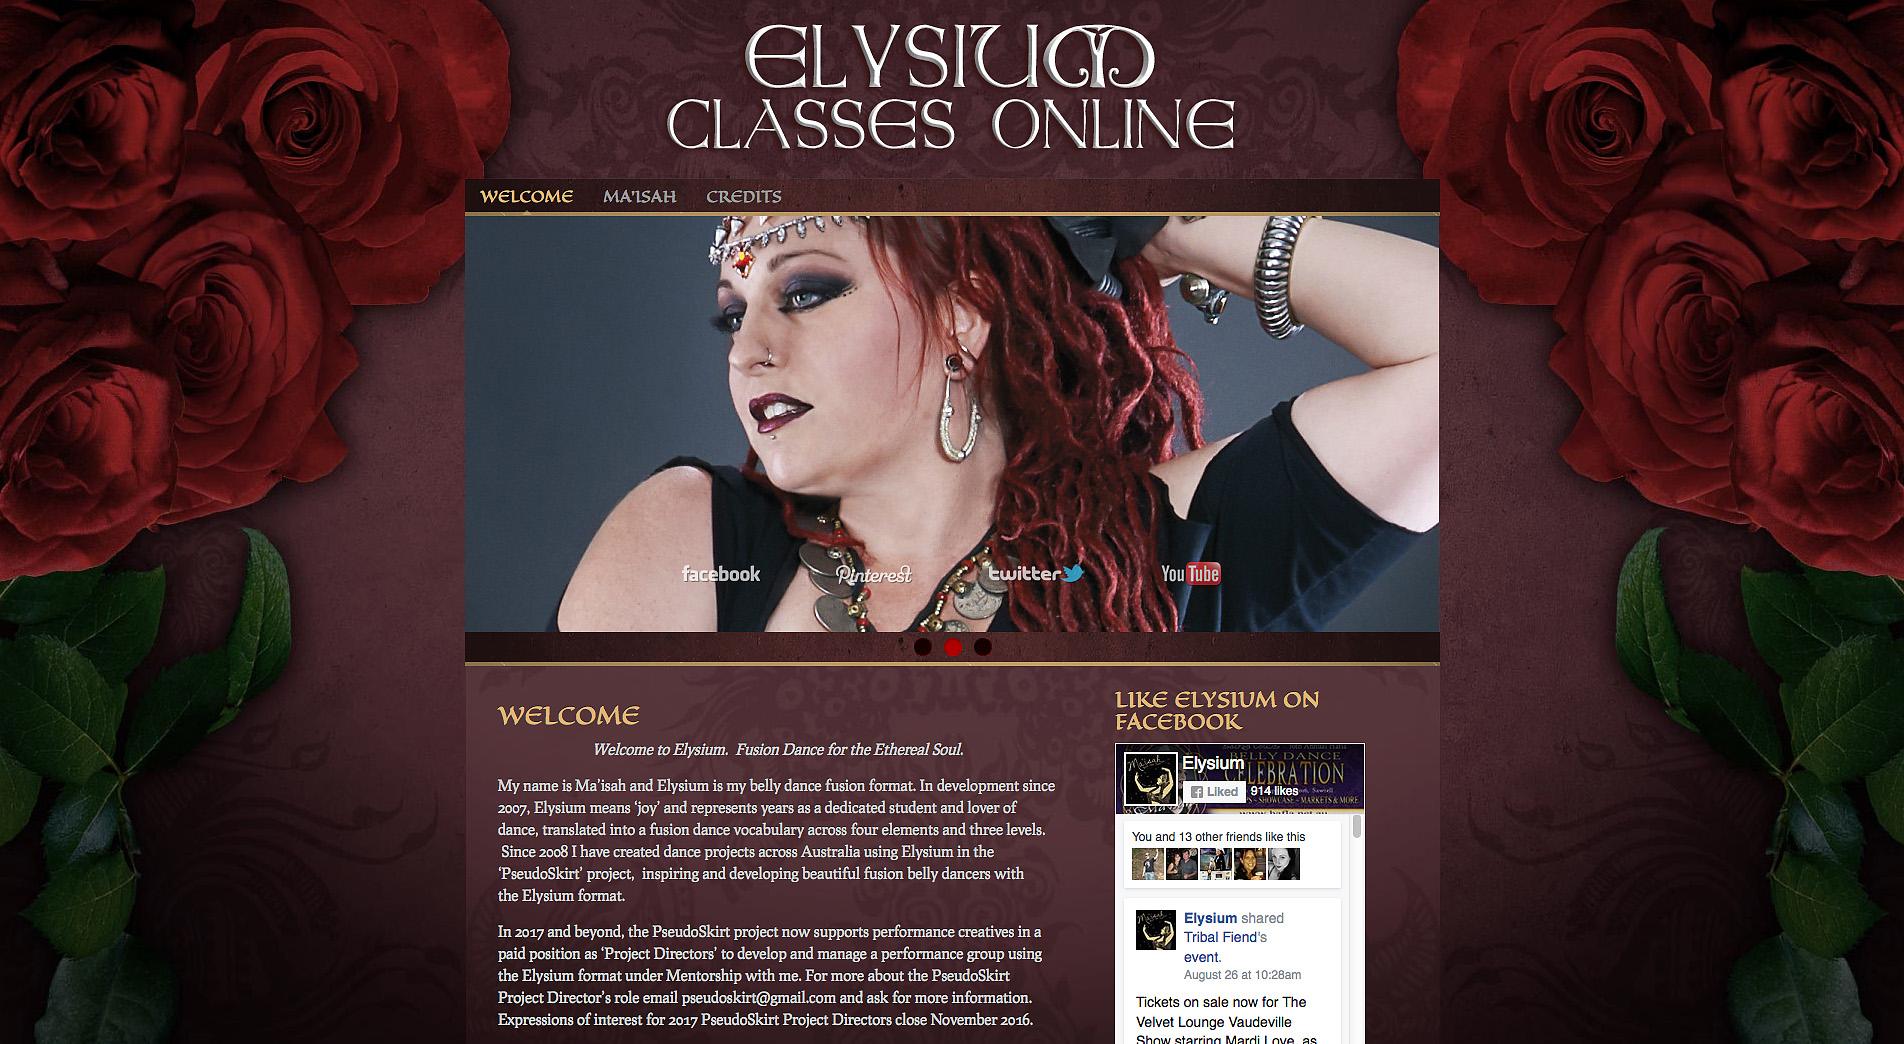 Elysium Classes Online Website - First Version